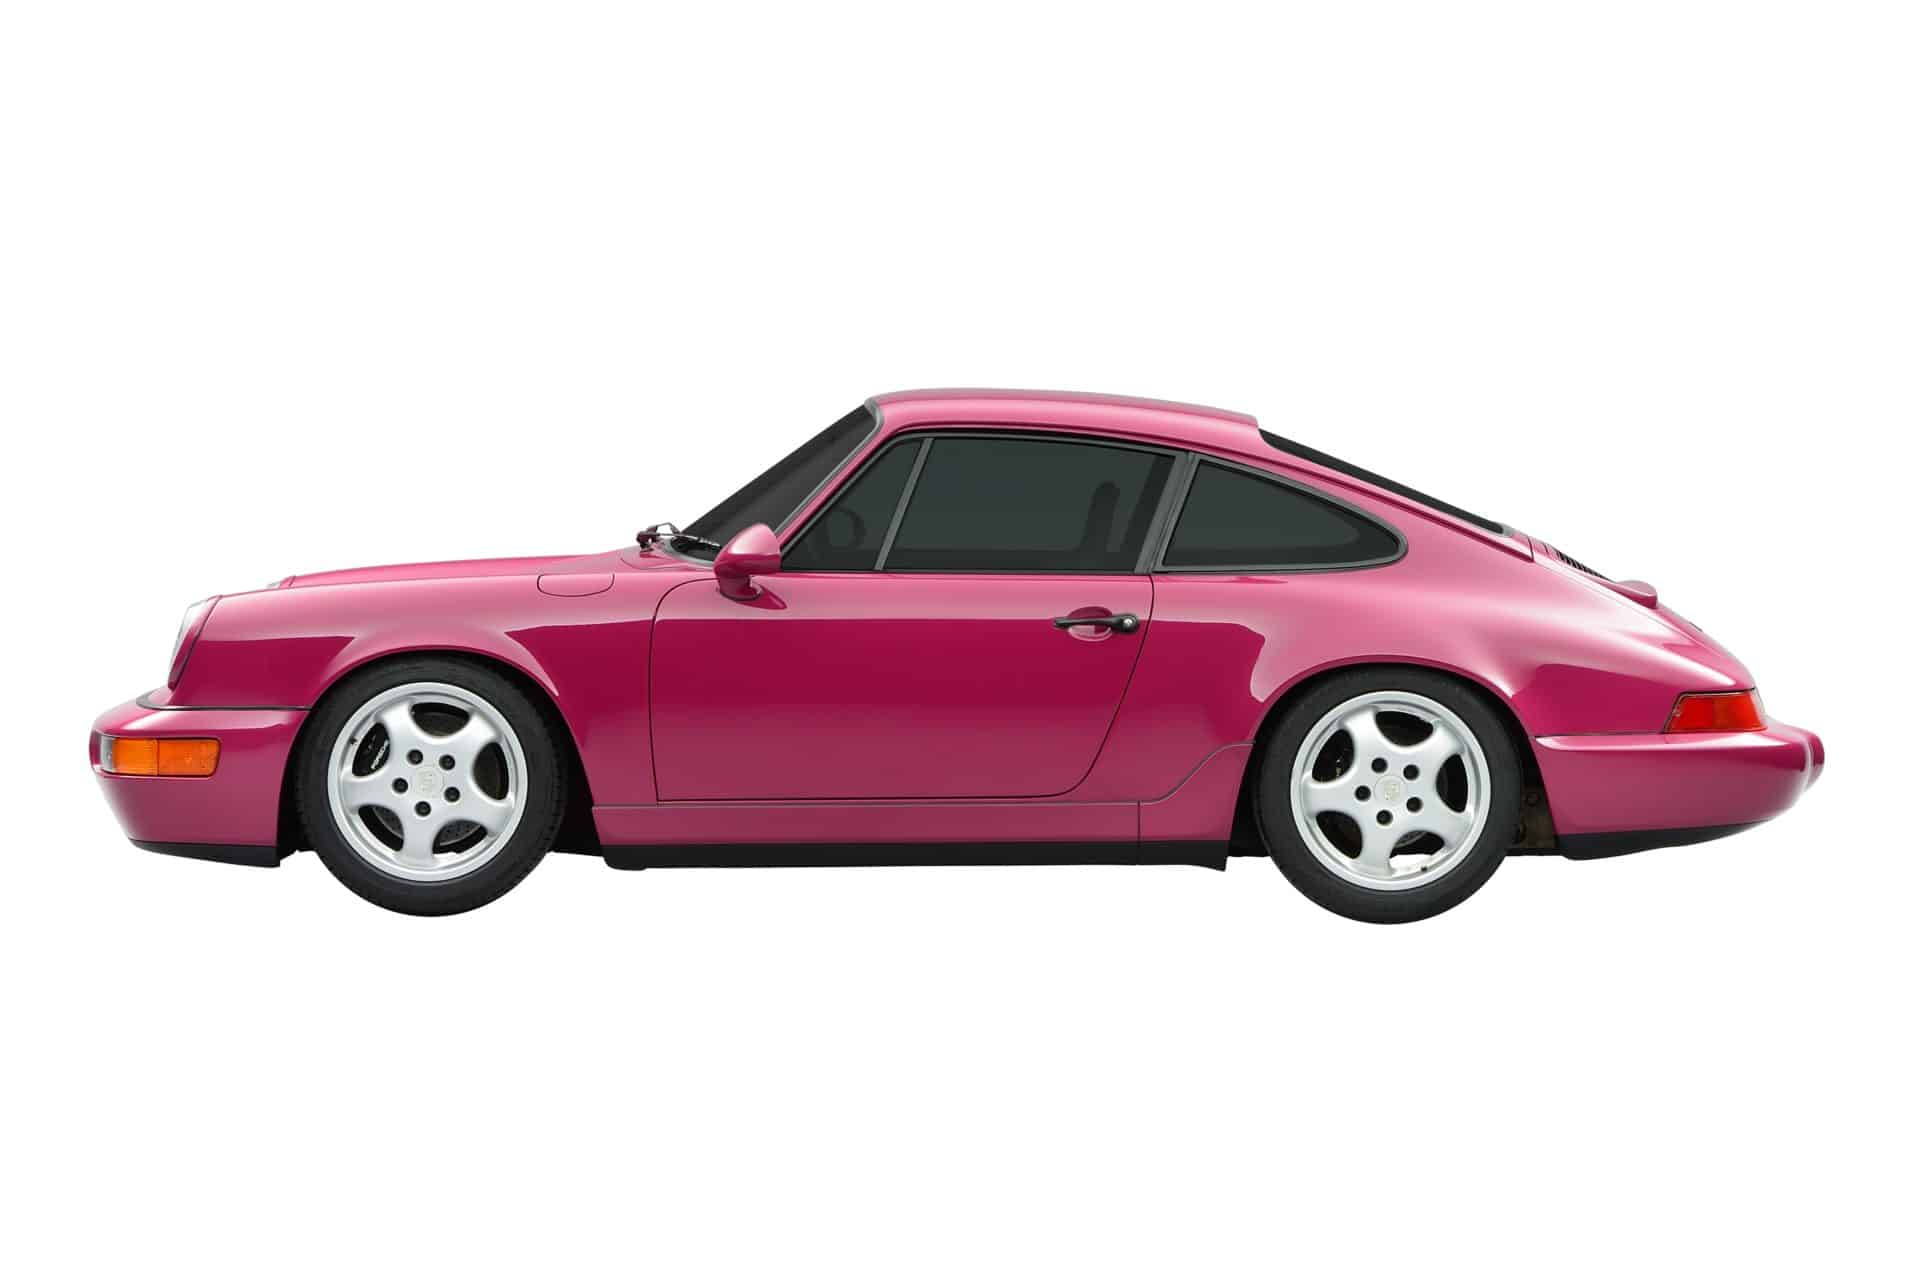 Porsche 911 ab 1989